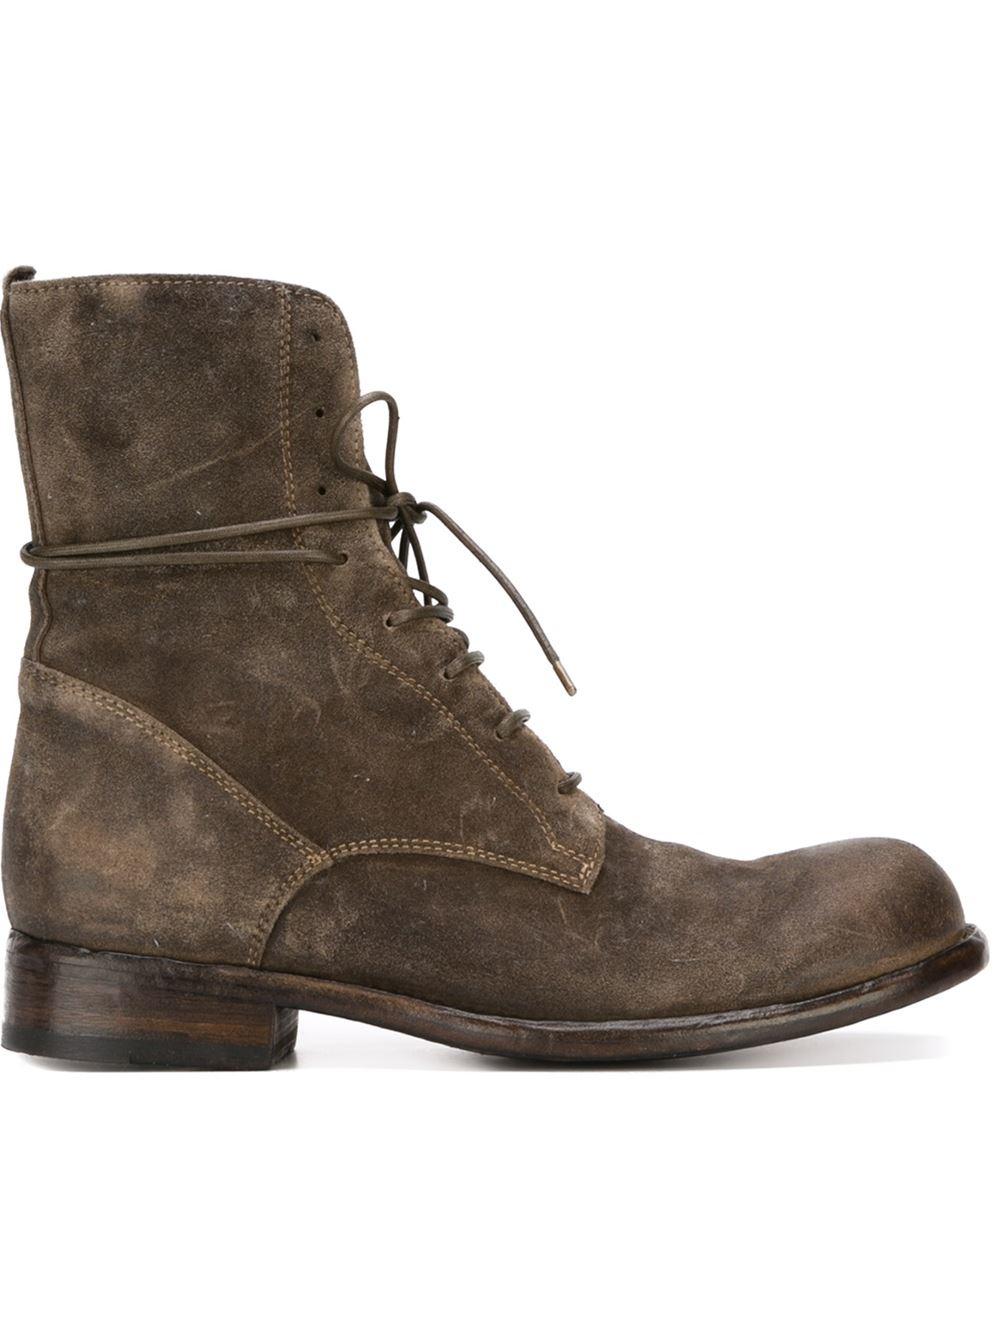 Creative Shop Officine Creative Legrand/042 Flint Ankle Boots U2013 MadisonStyle